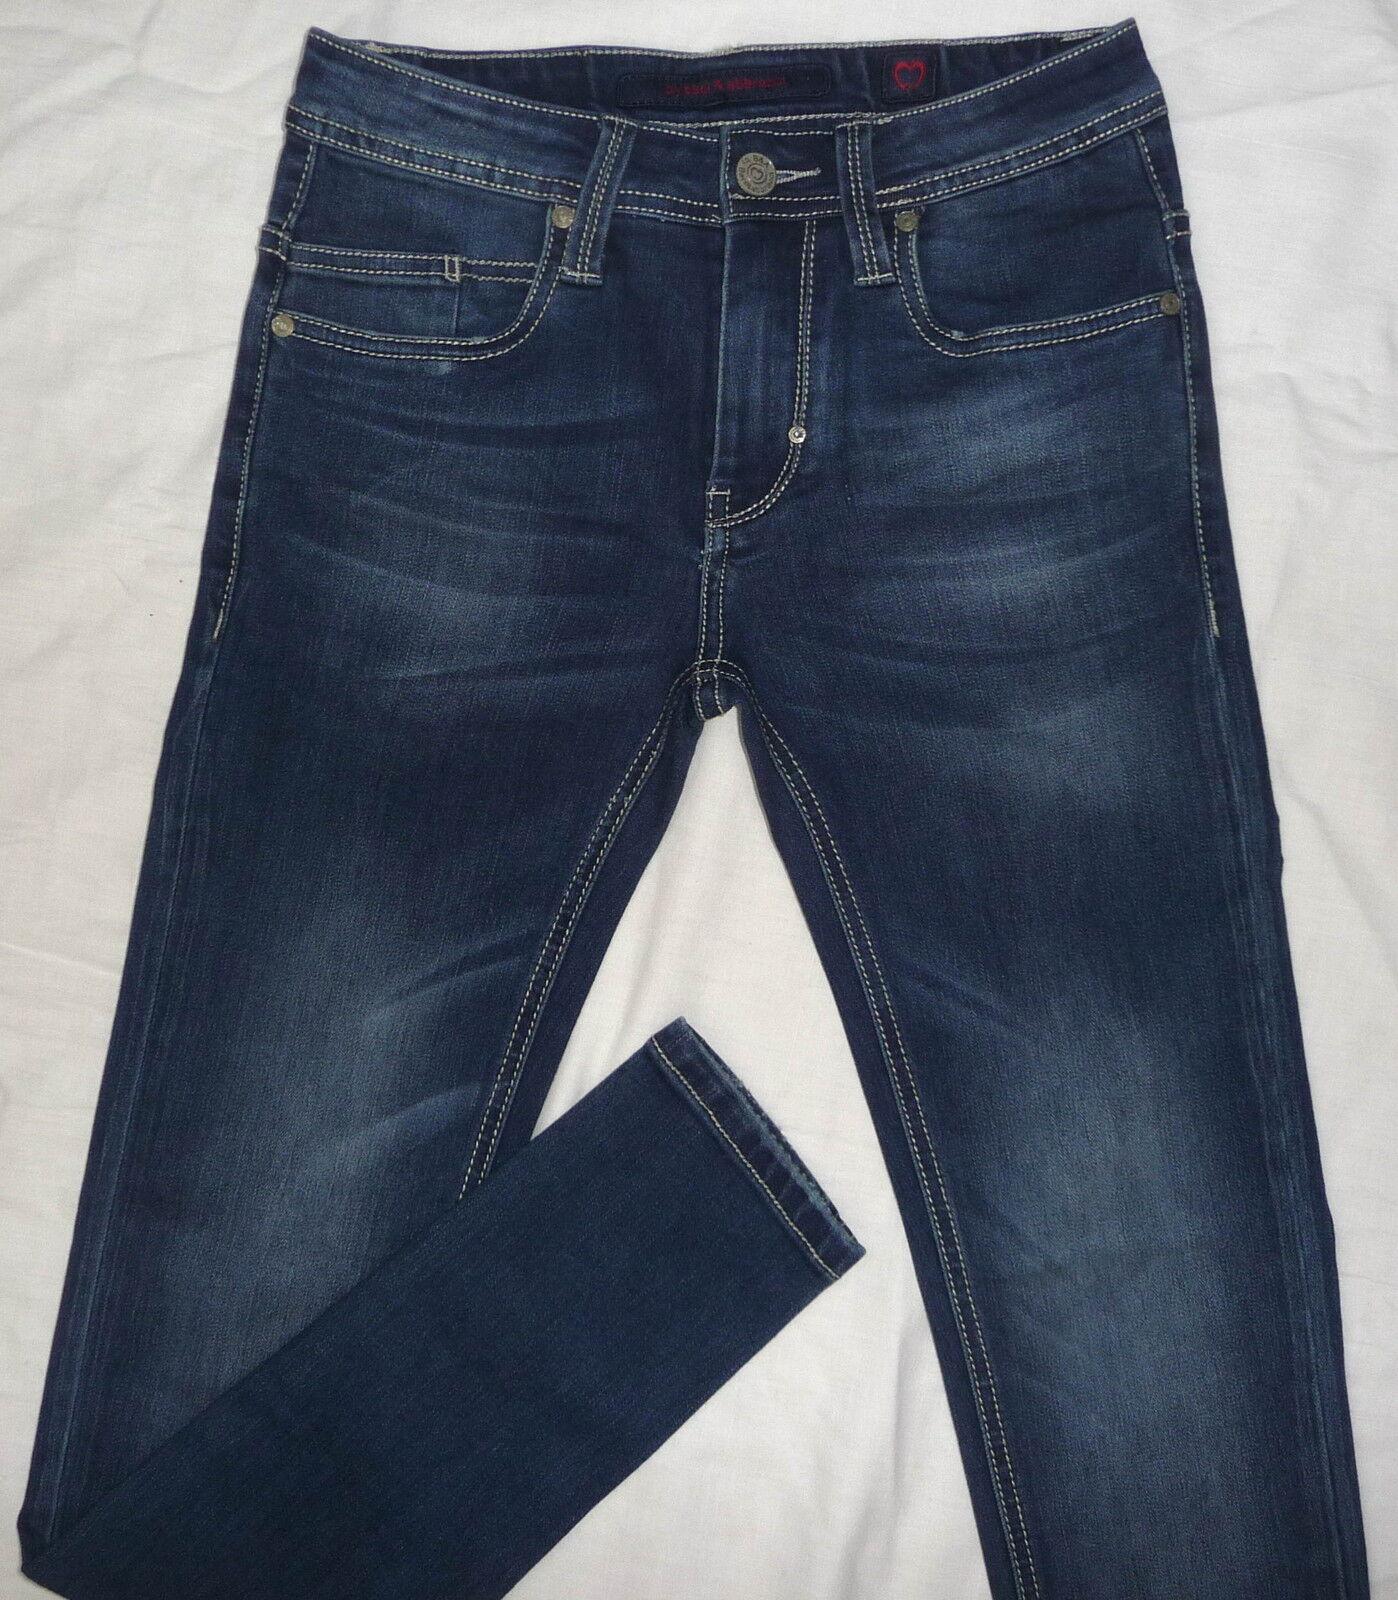 Jeans Skinny Uomo Baci Abbracci Gamba Stretta Originale Elastici 44 46 48 50 52